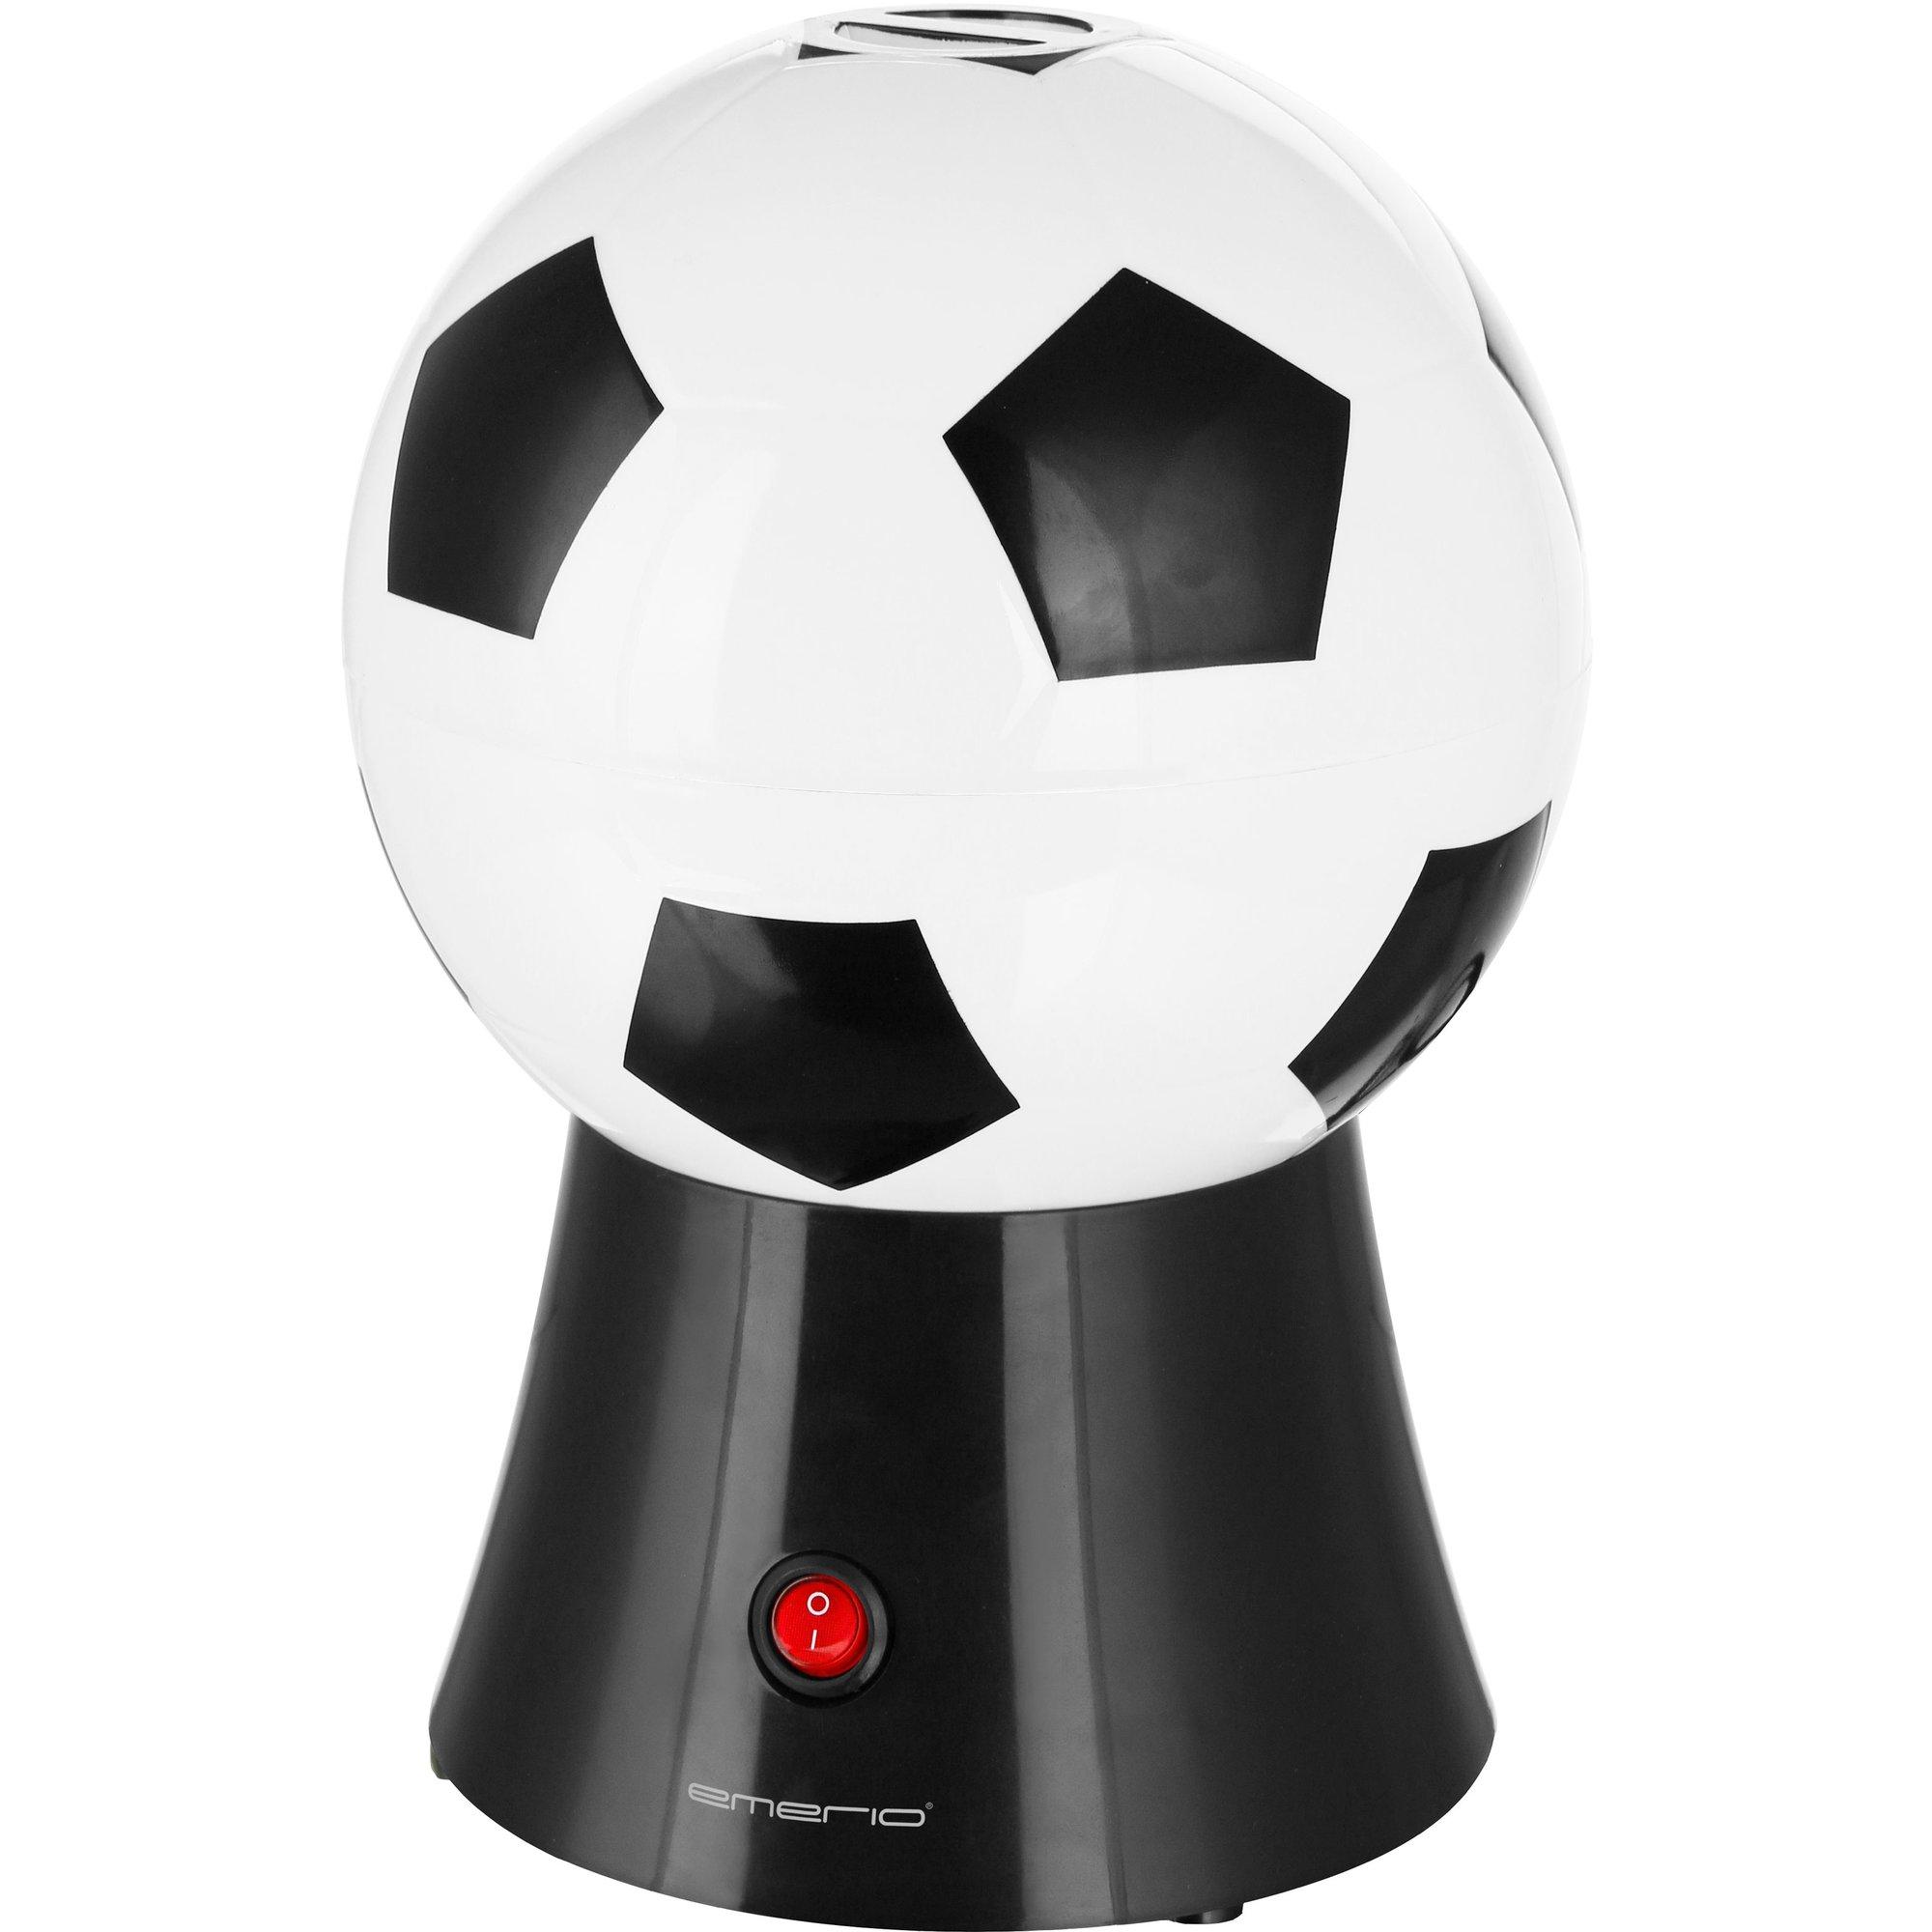 Emerio Popcornmaskin i fotbollsdesign